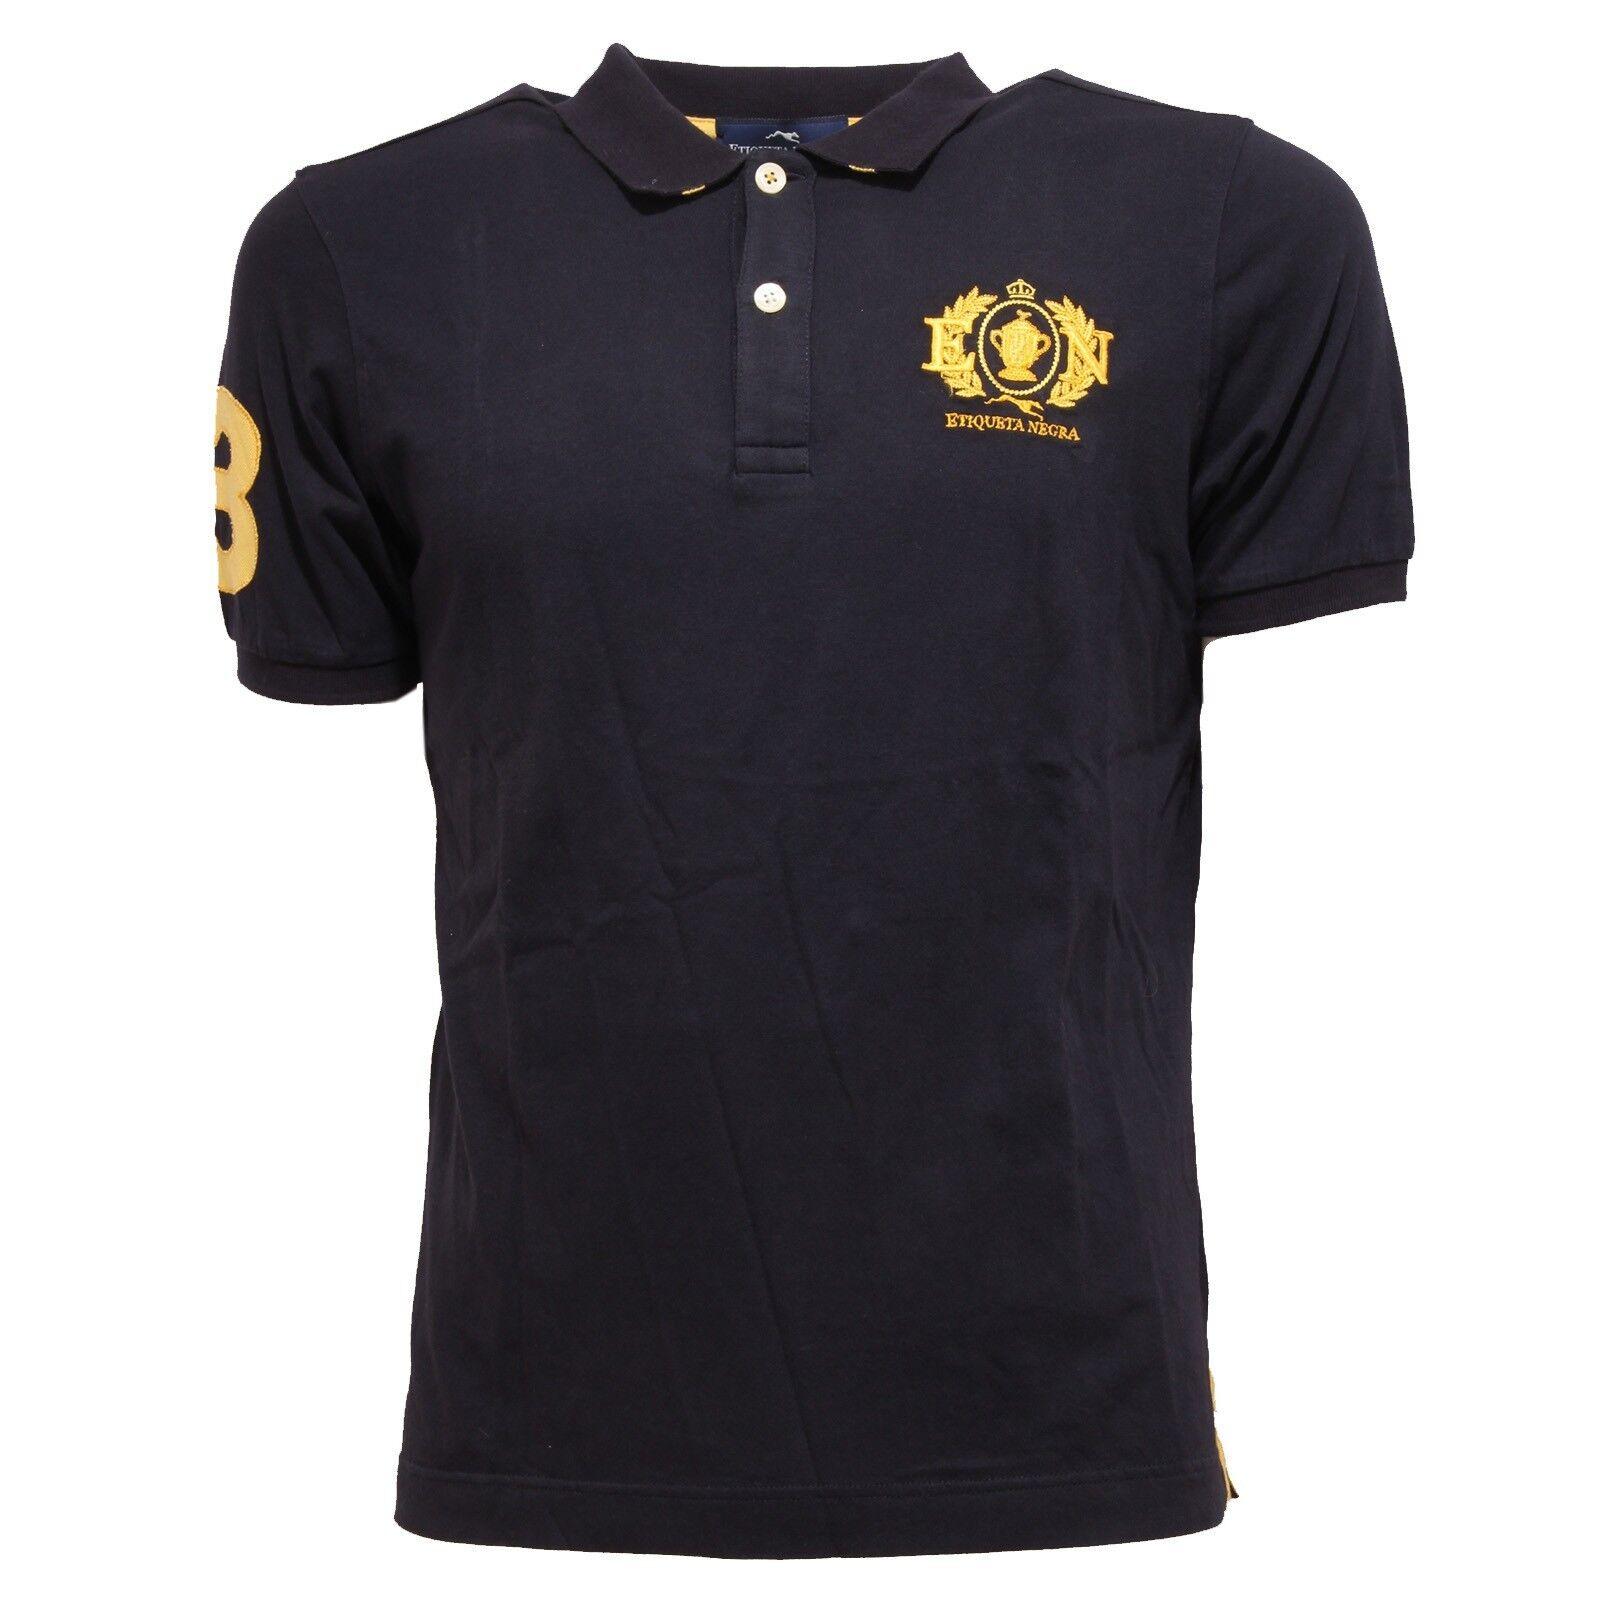 9161Q polo short sleeve ETIQUETA NEGRA blu maglia uomo t-shirt men